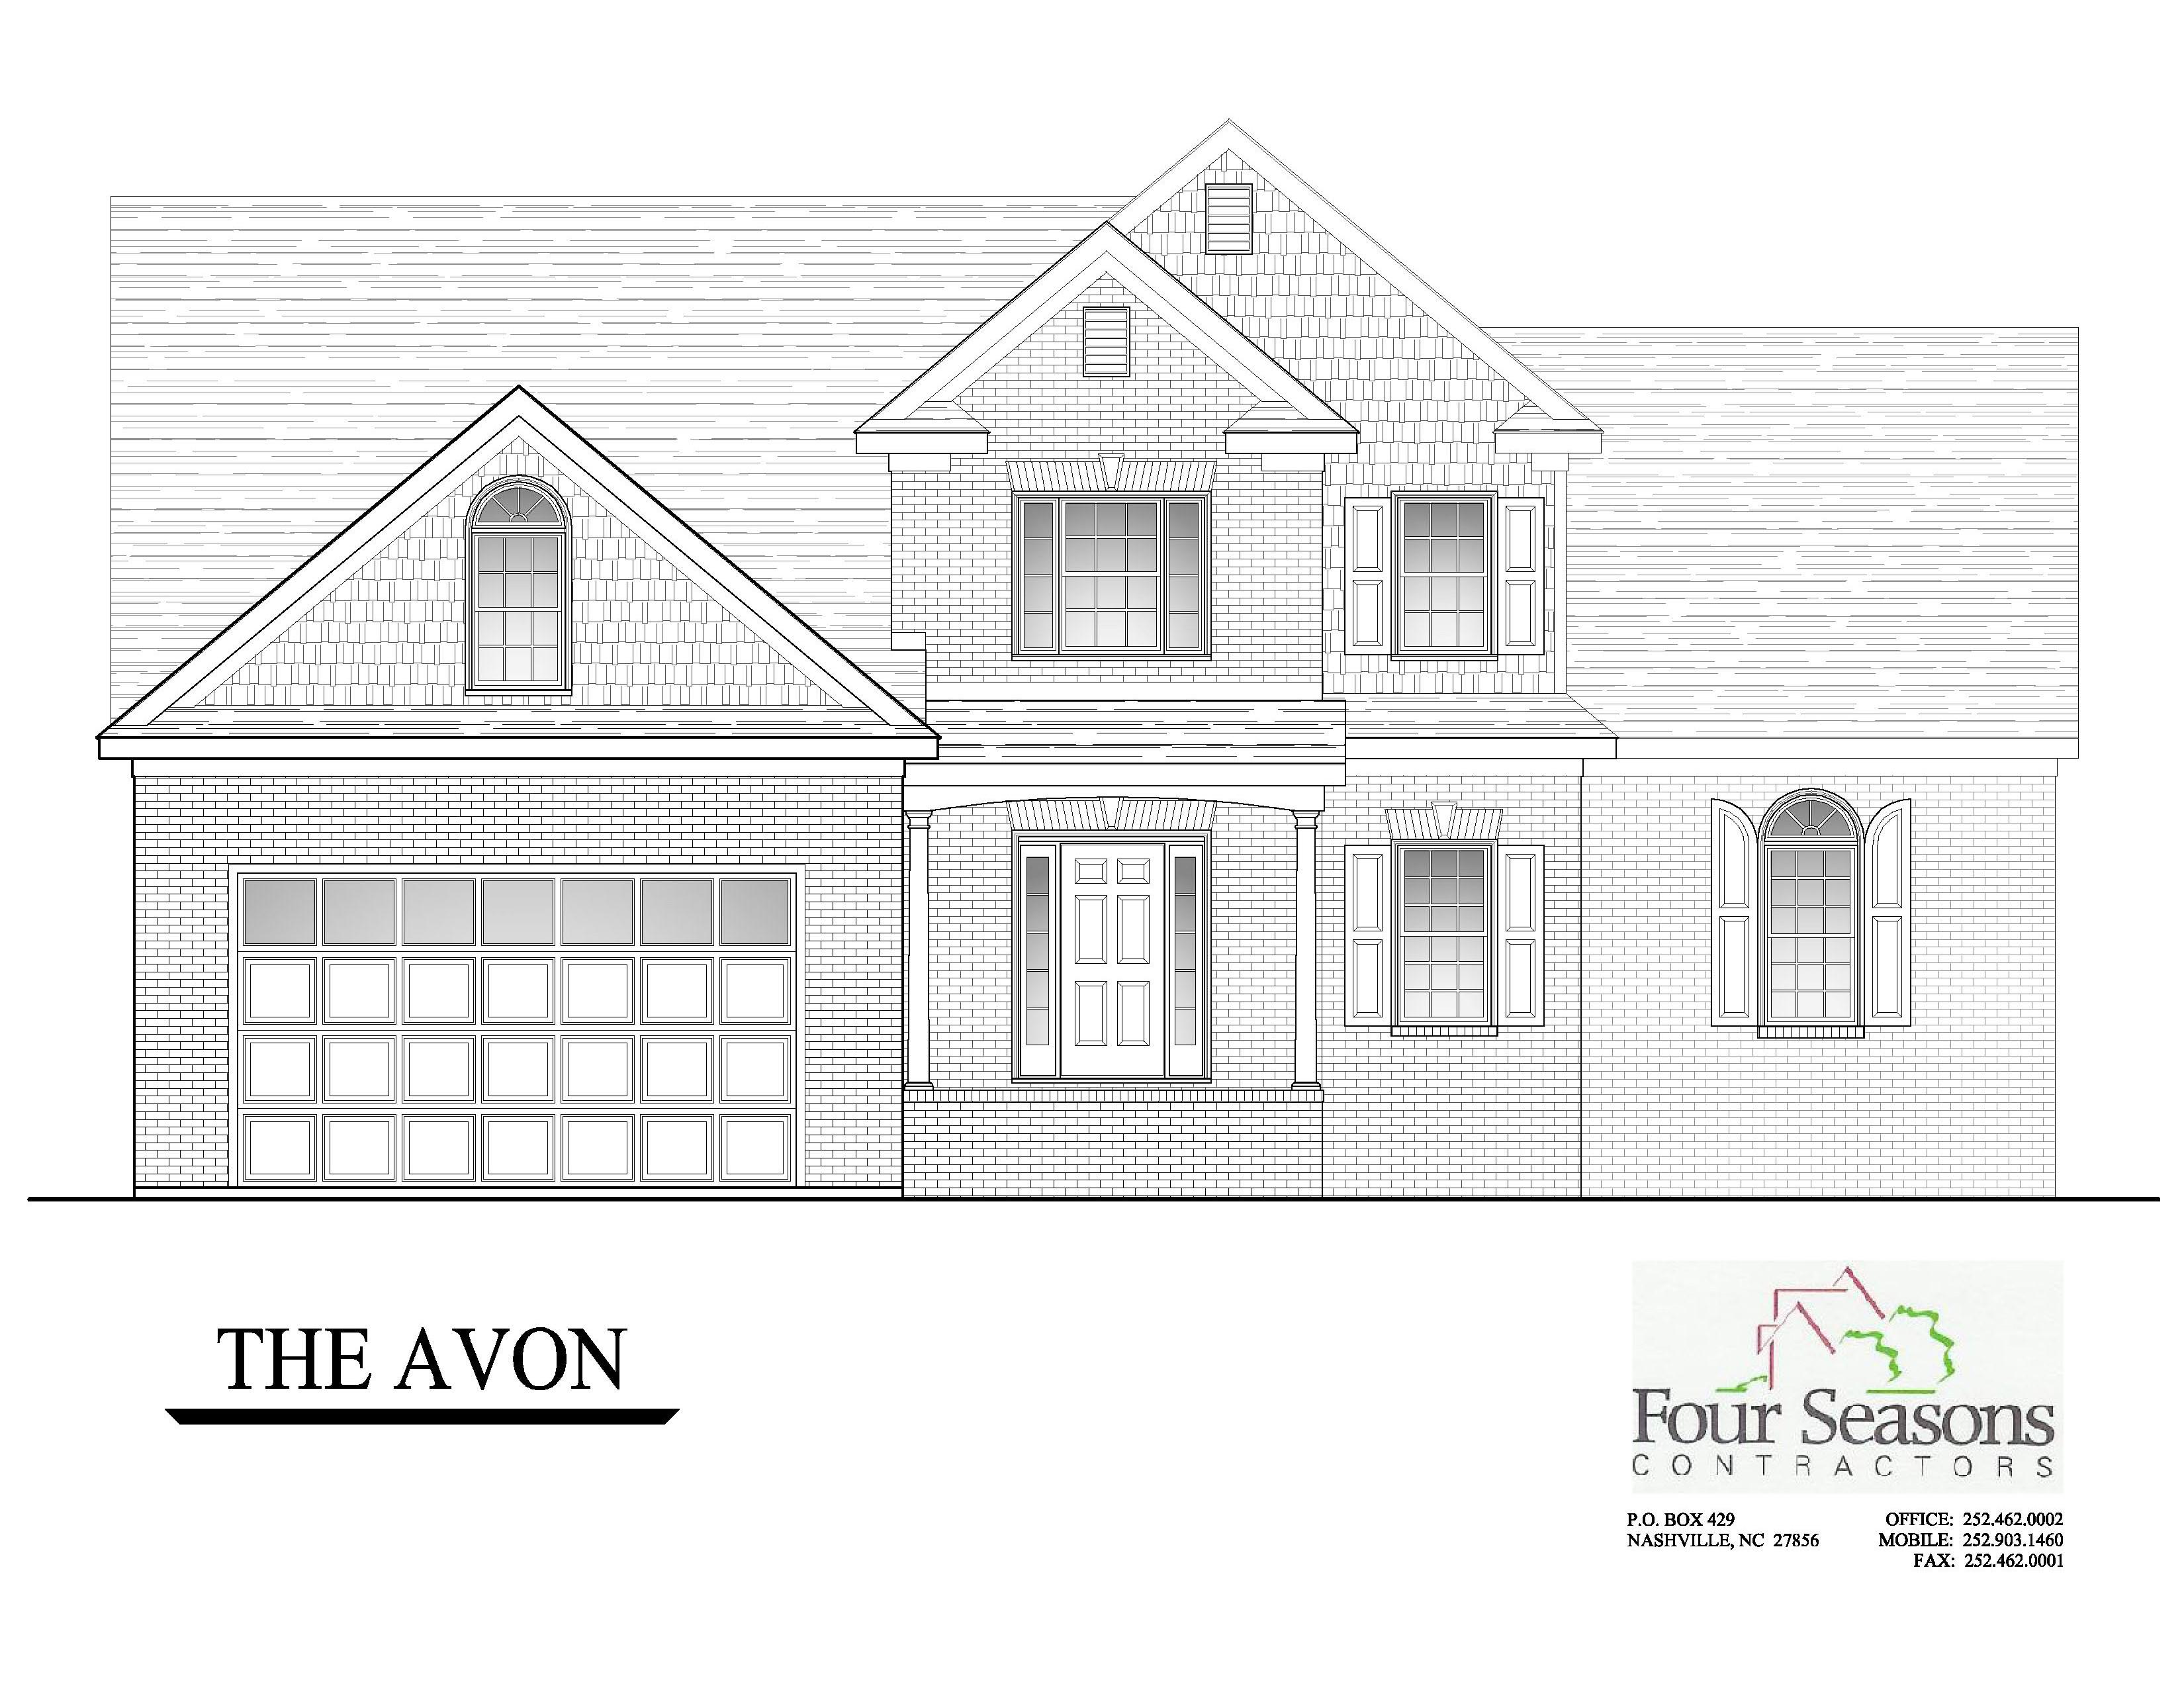 Four Seasons Contractors Homes for Sale New Construction – Home Building Plans For Sale